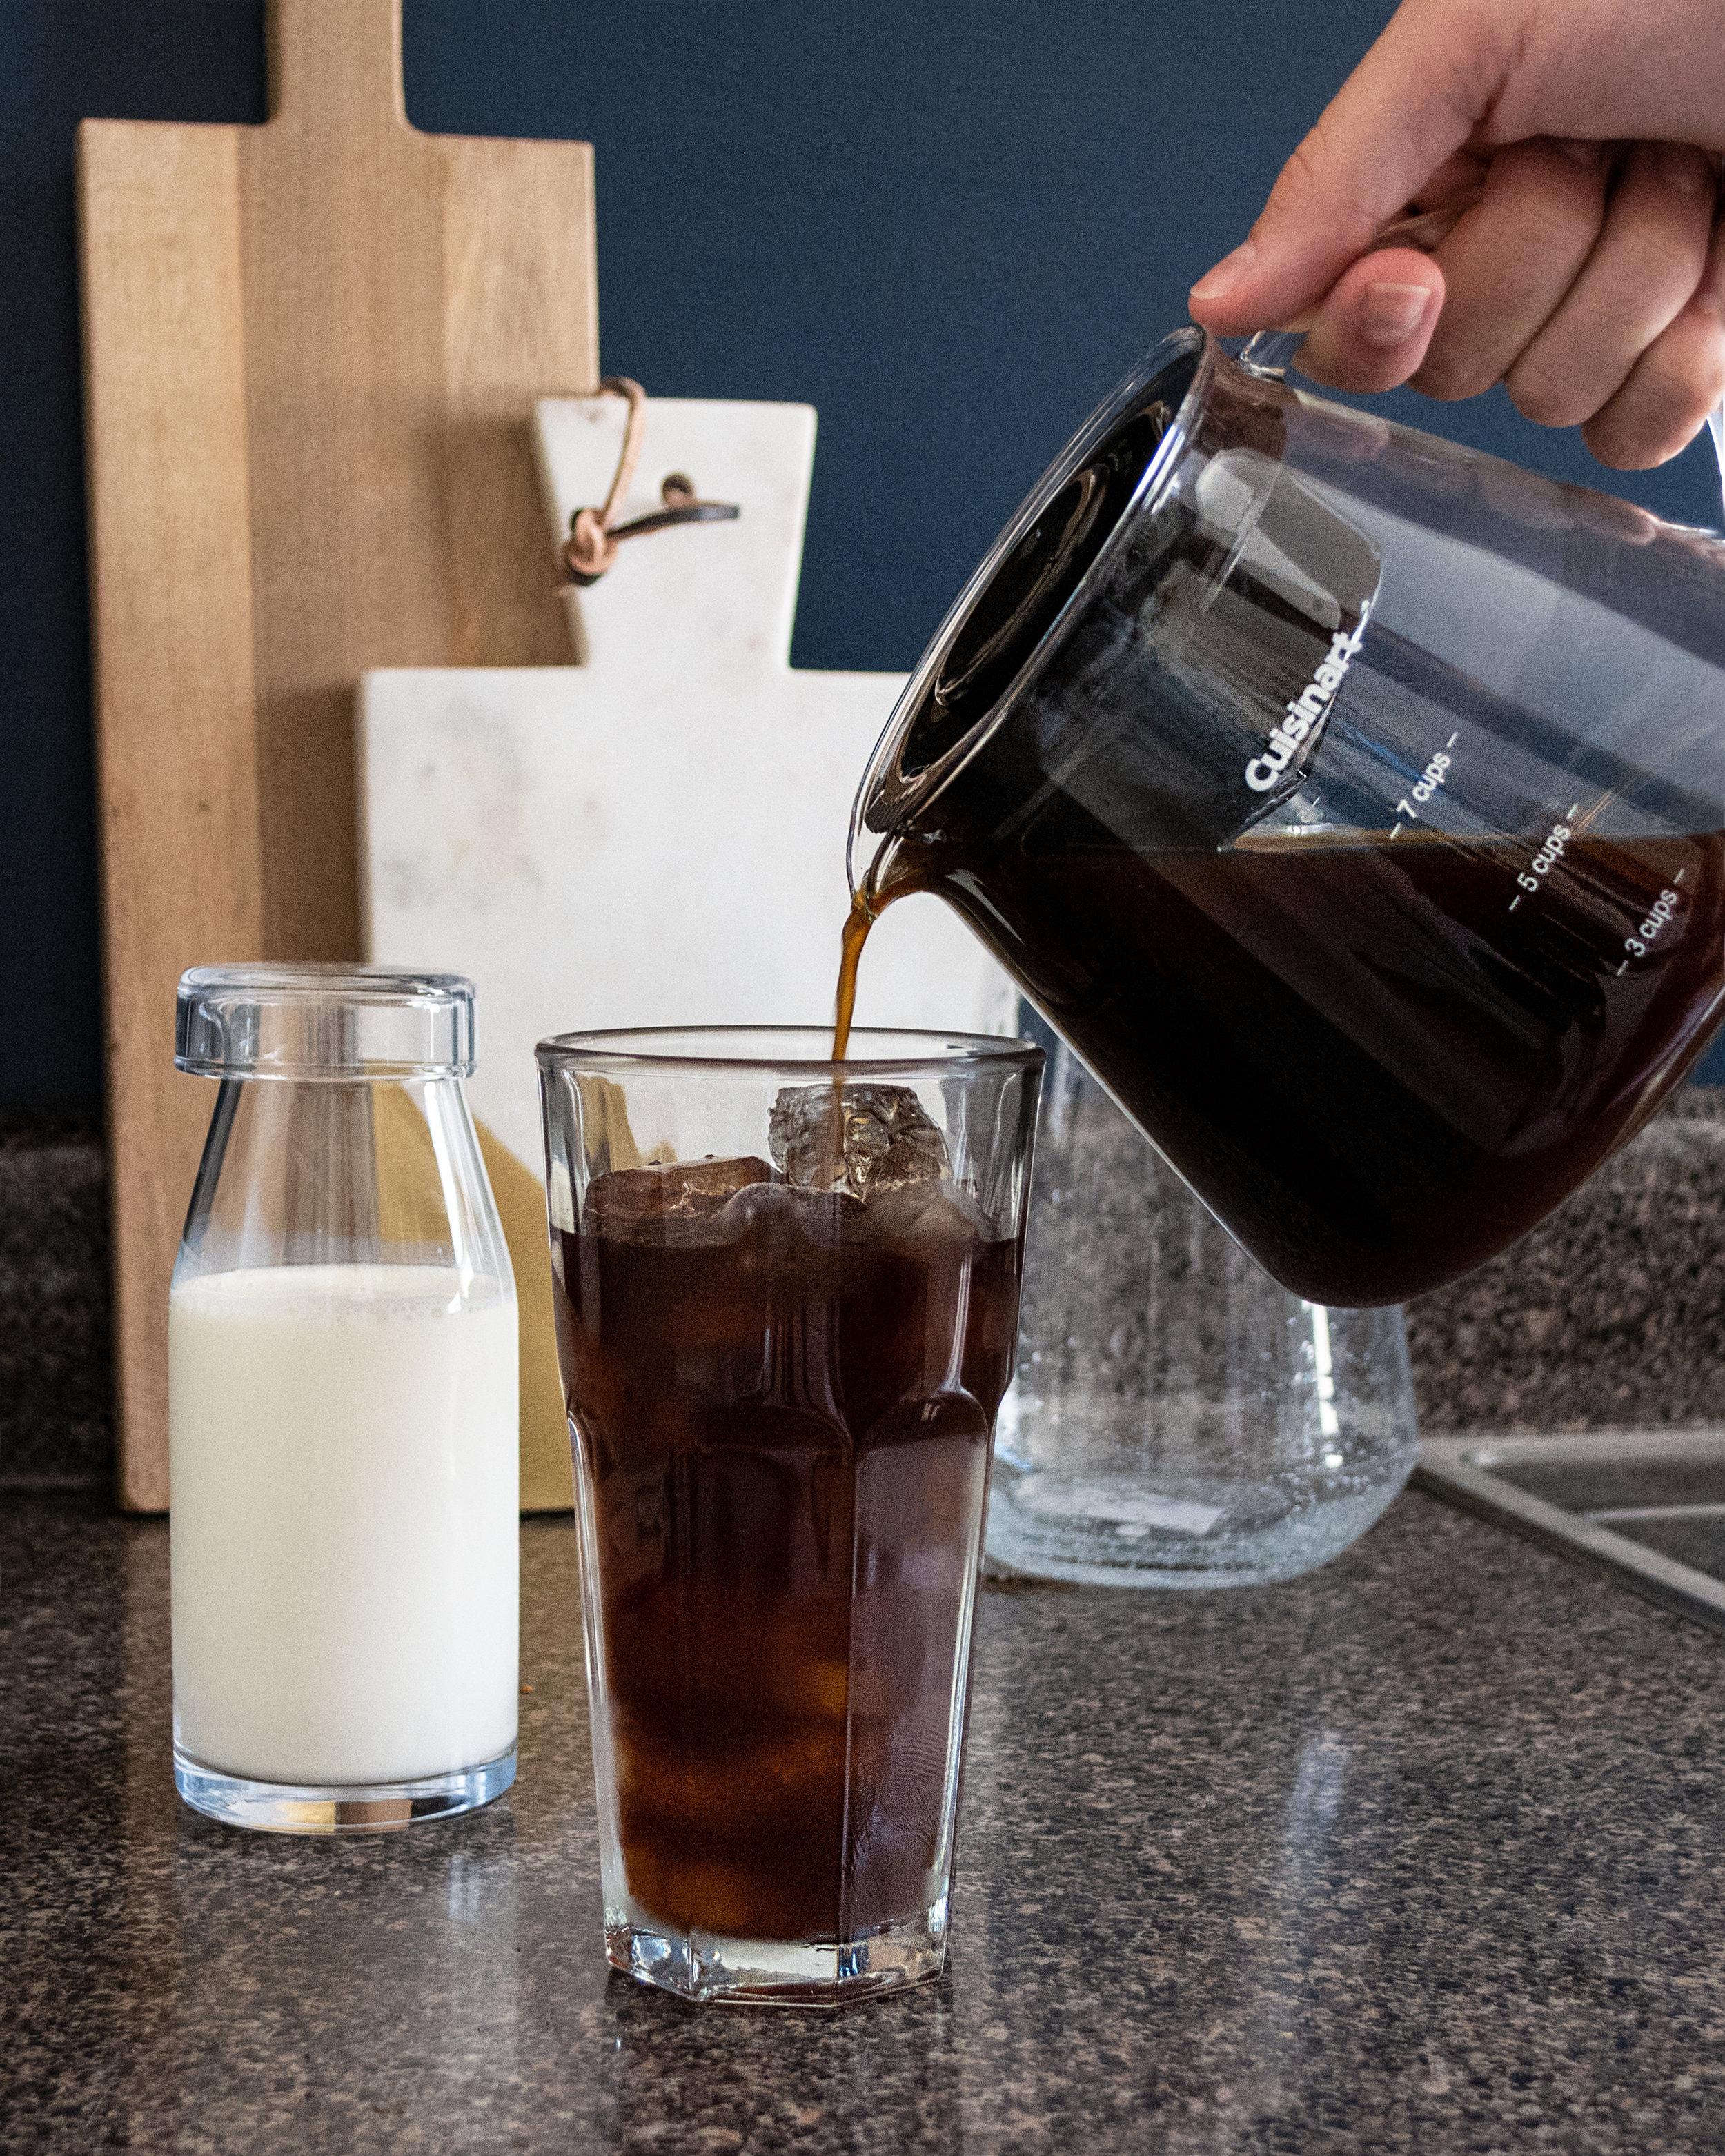 Cuisinart Cold Brew Coffee Machine | The Modern Otter #CuisinartColdBrew